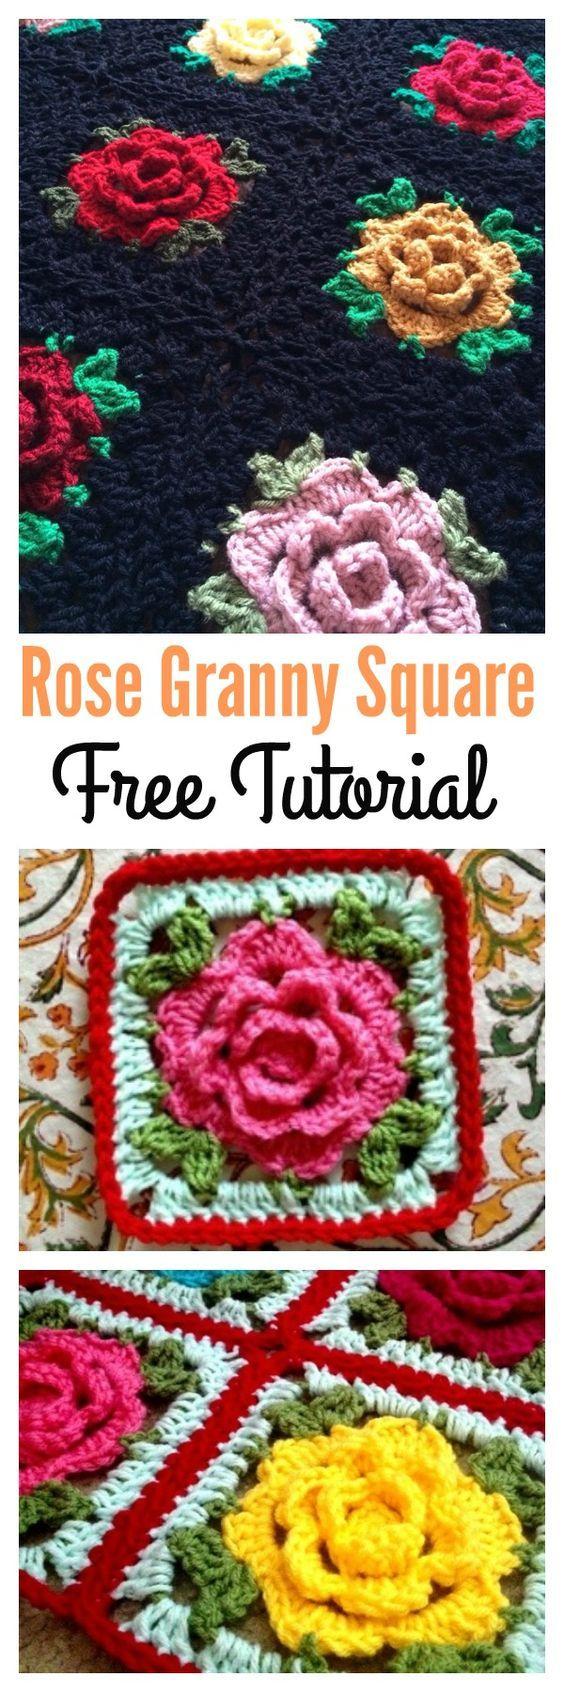 Crochet Rose Granny Square Afghan Free Patterns | Manta y Ganchillo